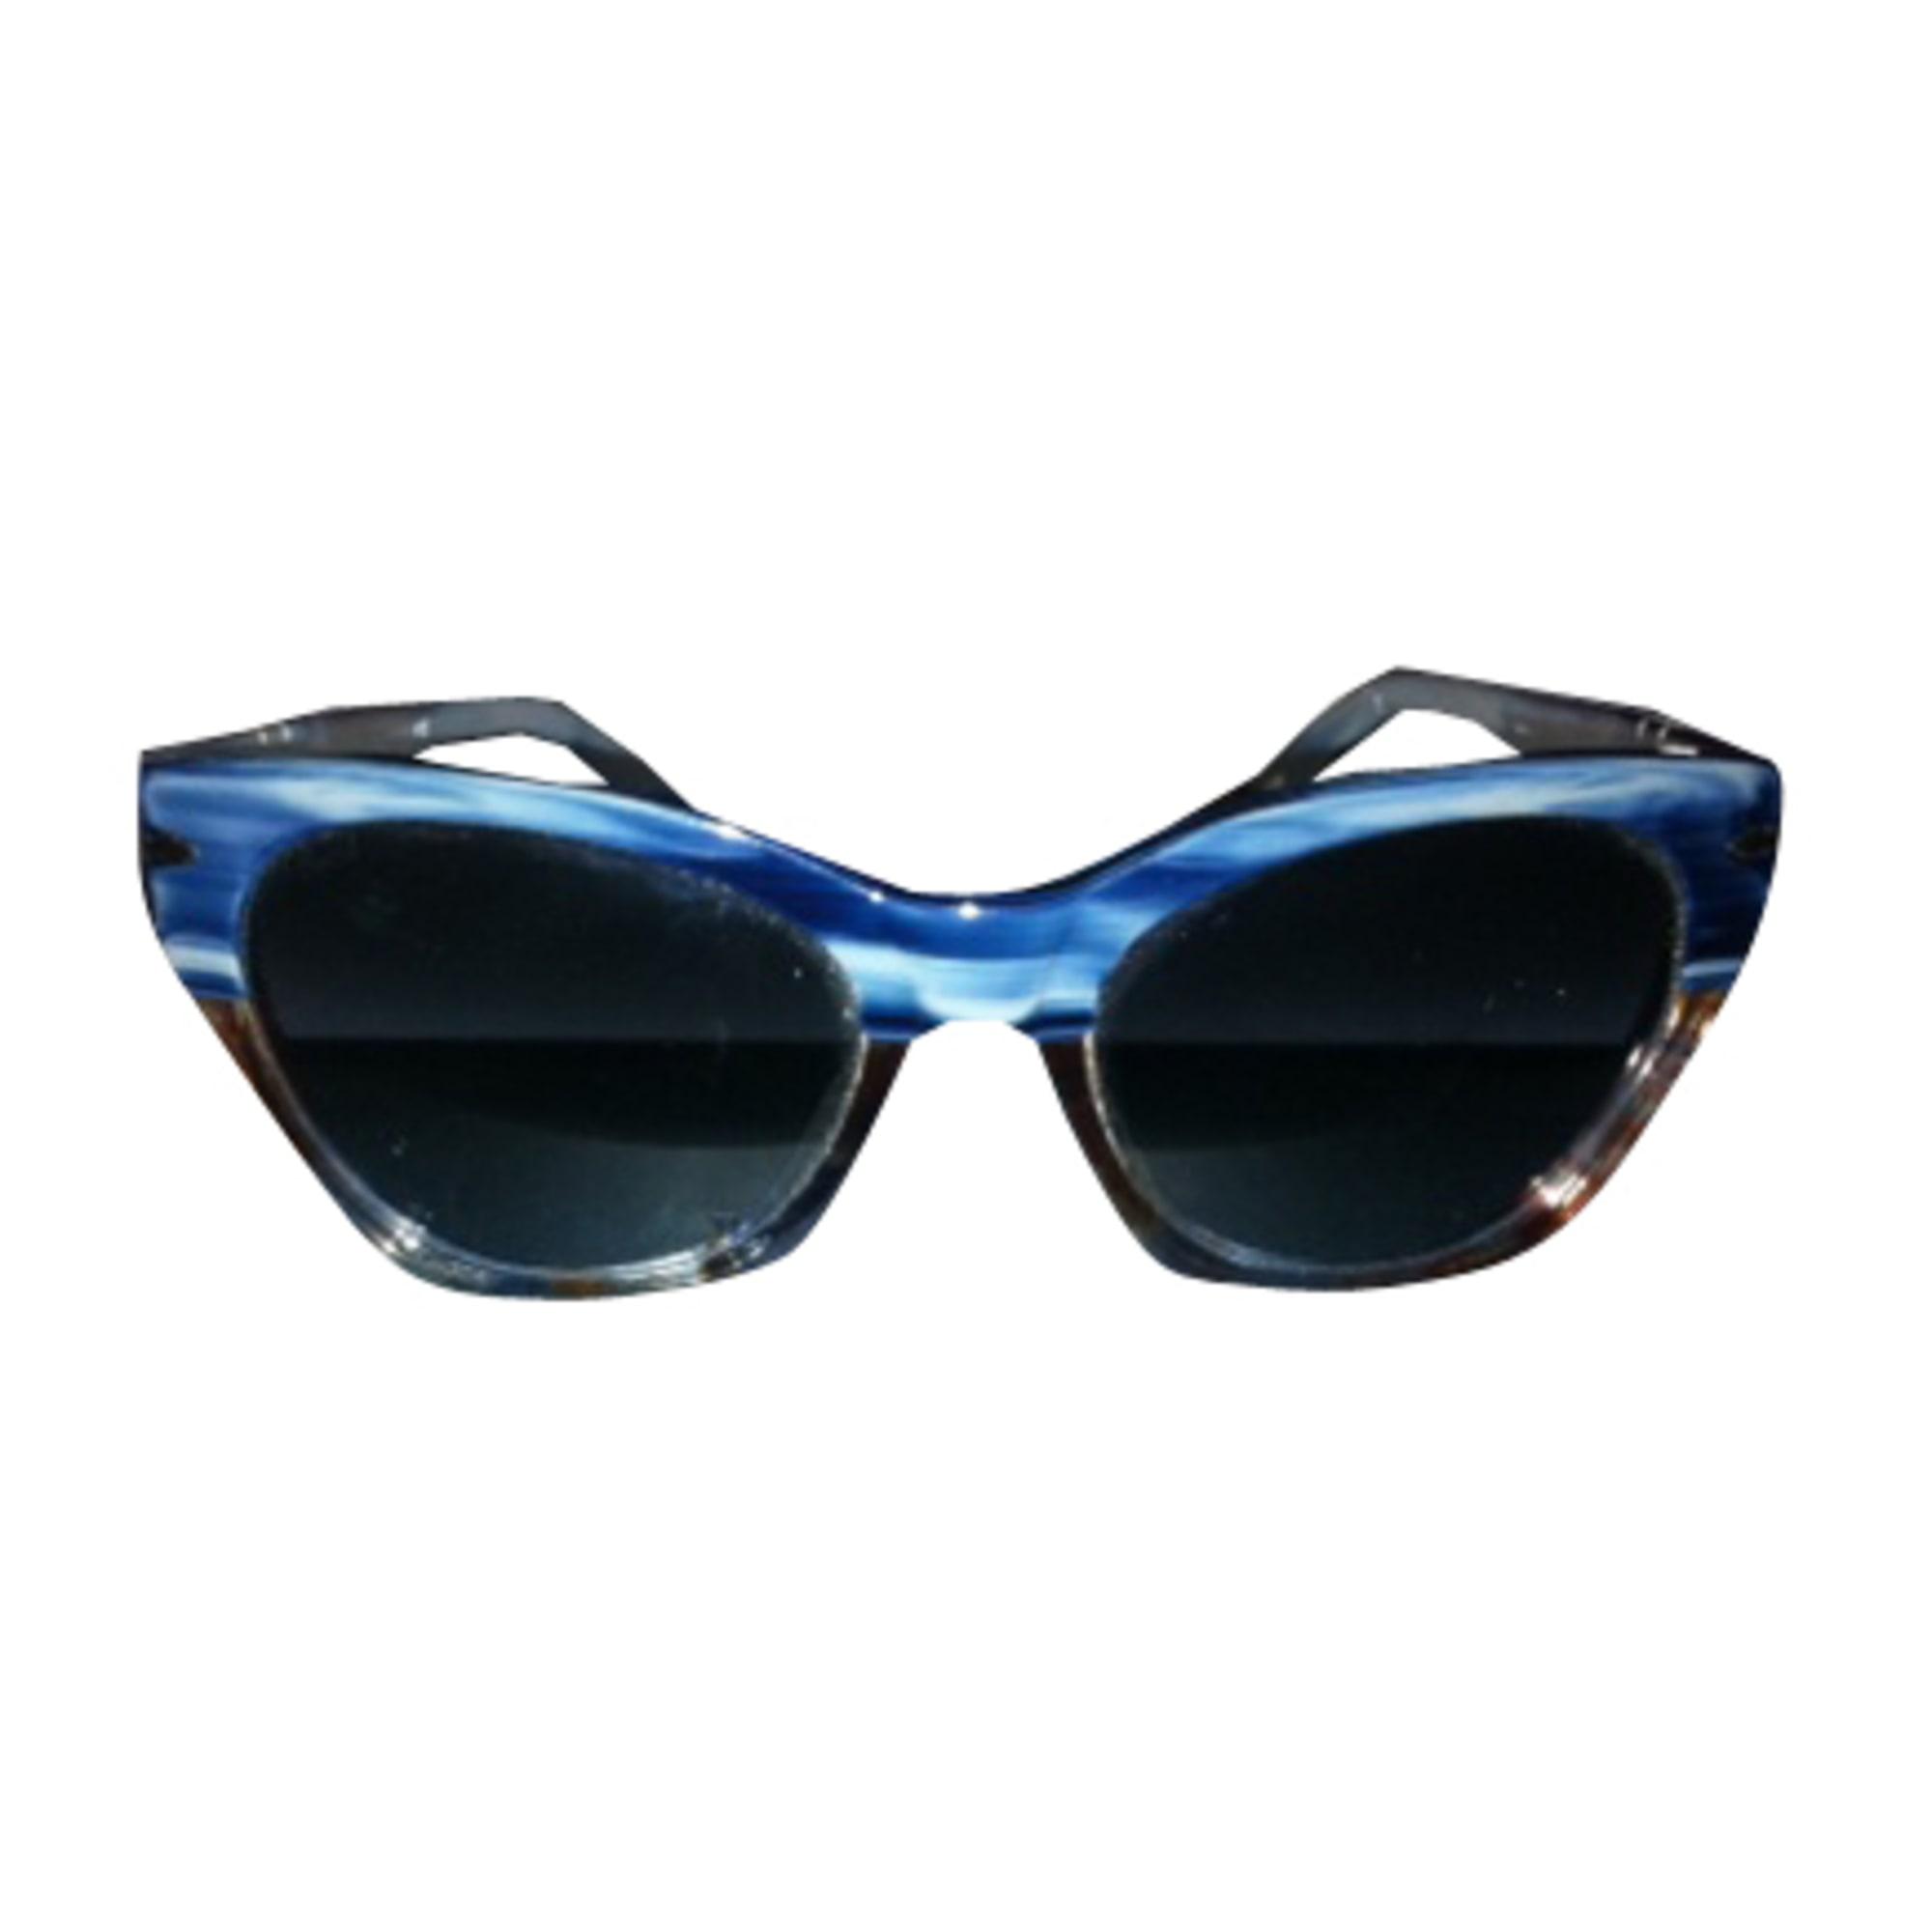 Lunettes de soleil PERSOL bleu vendu par Sacha 122 - 1070845 49f4c3c70593